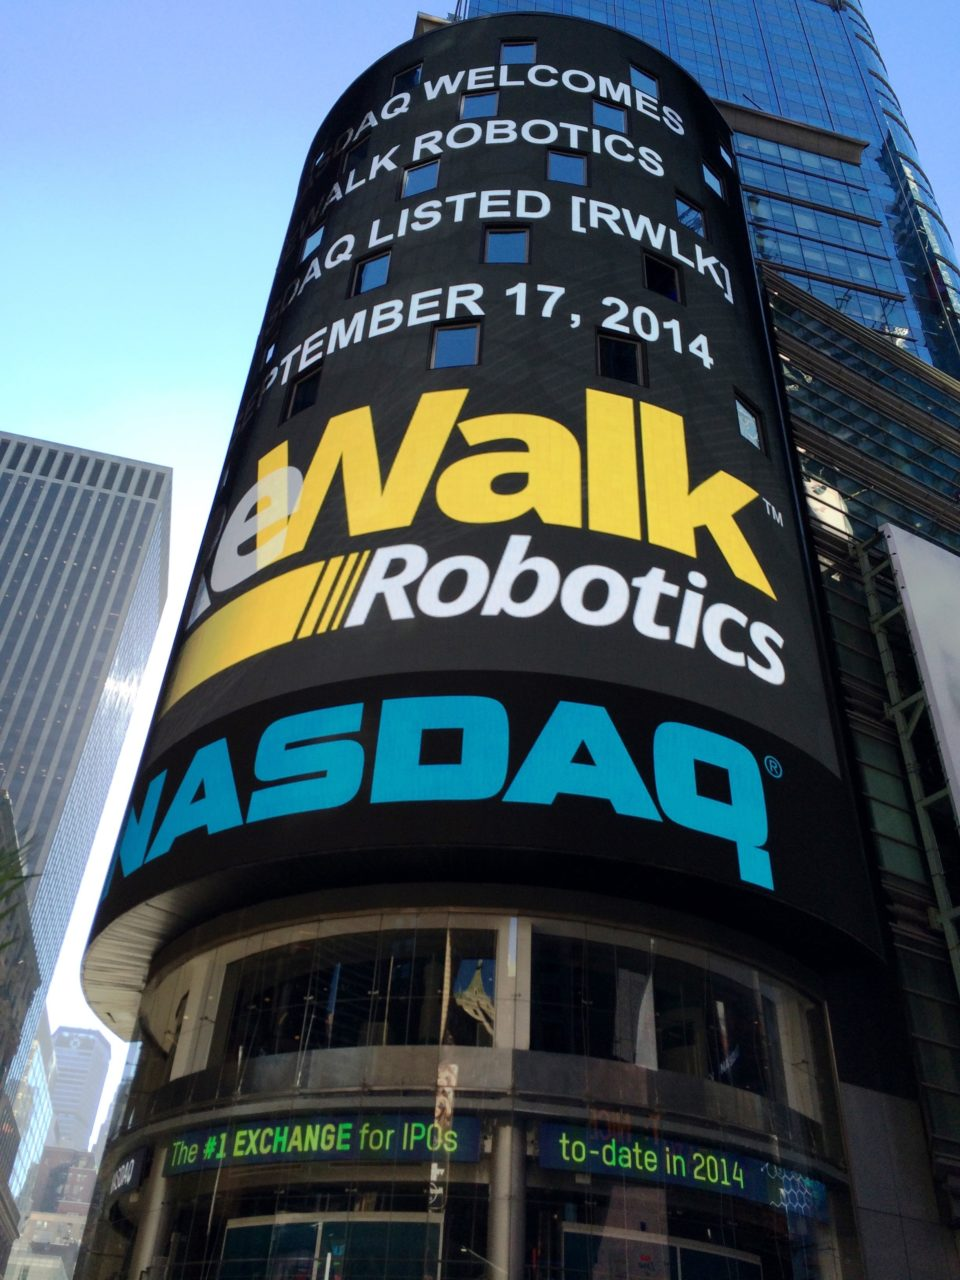 Technion : Technion Alumnus Has His Day on Wall Street as ReWalk Stock Soars